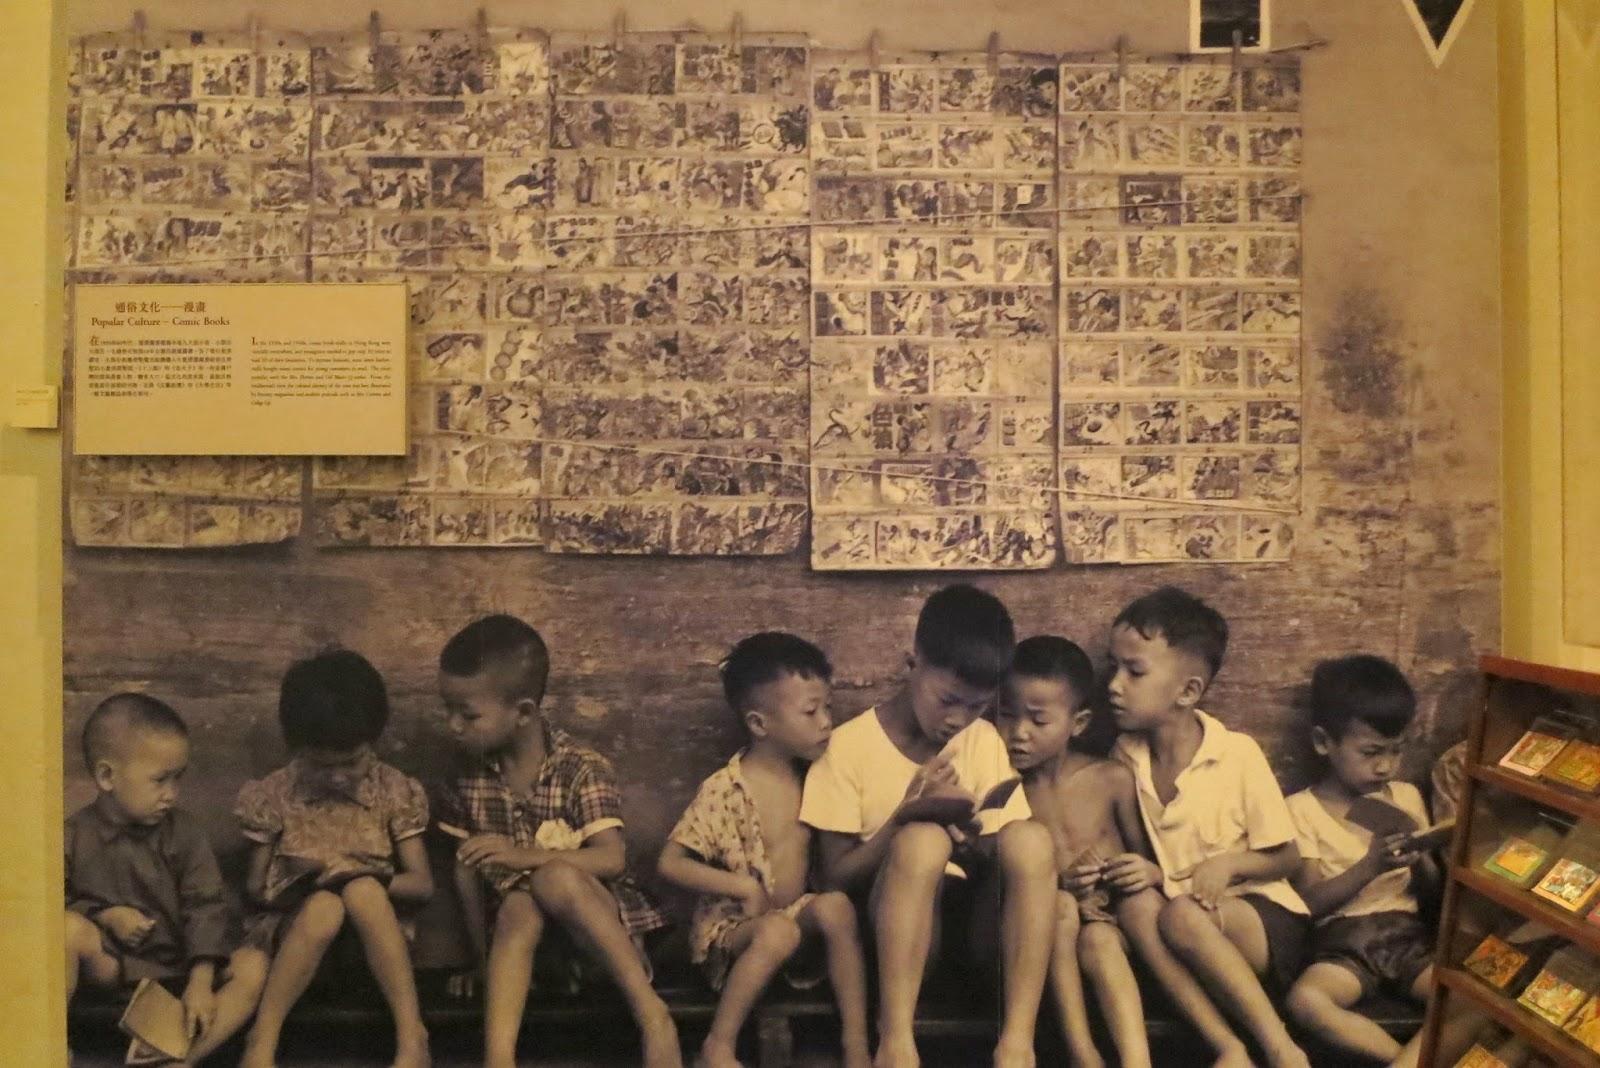 tenth letter of the alphabet  comics  hong kong comic books